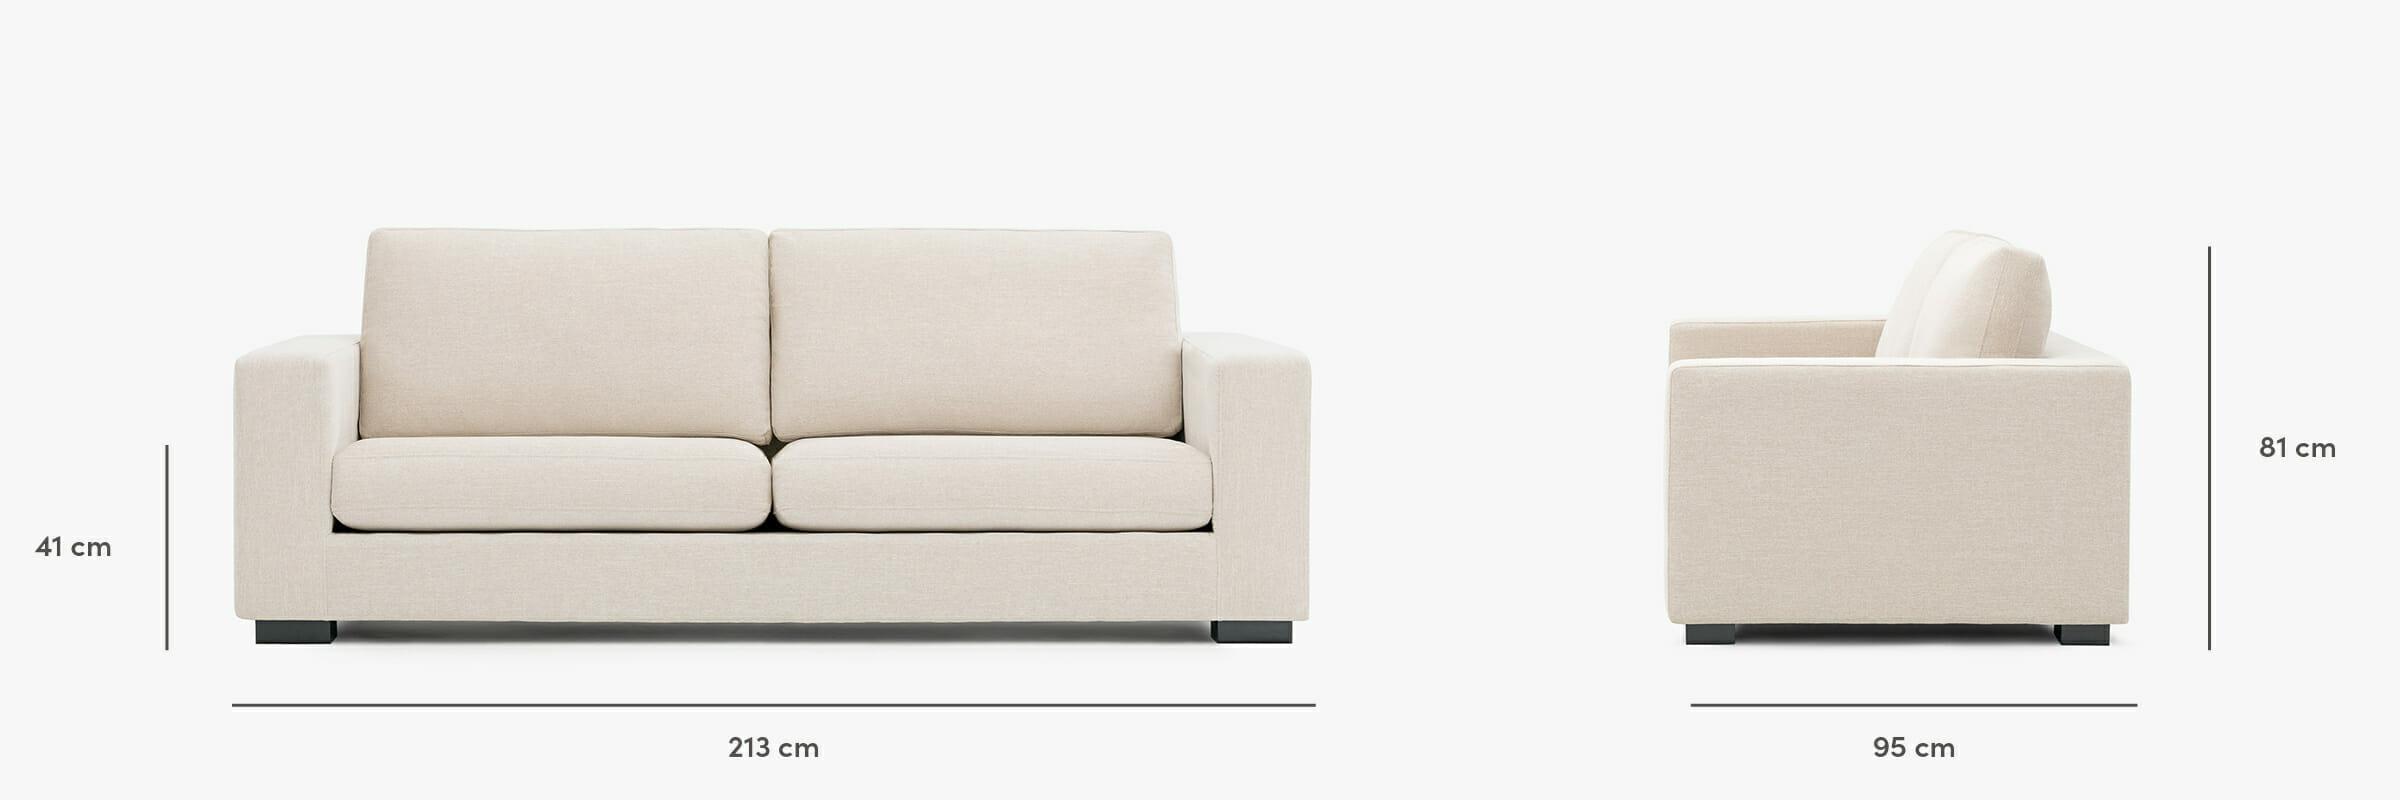 Malibu sofa dimensions